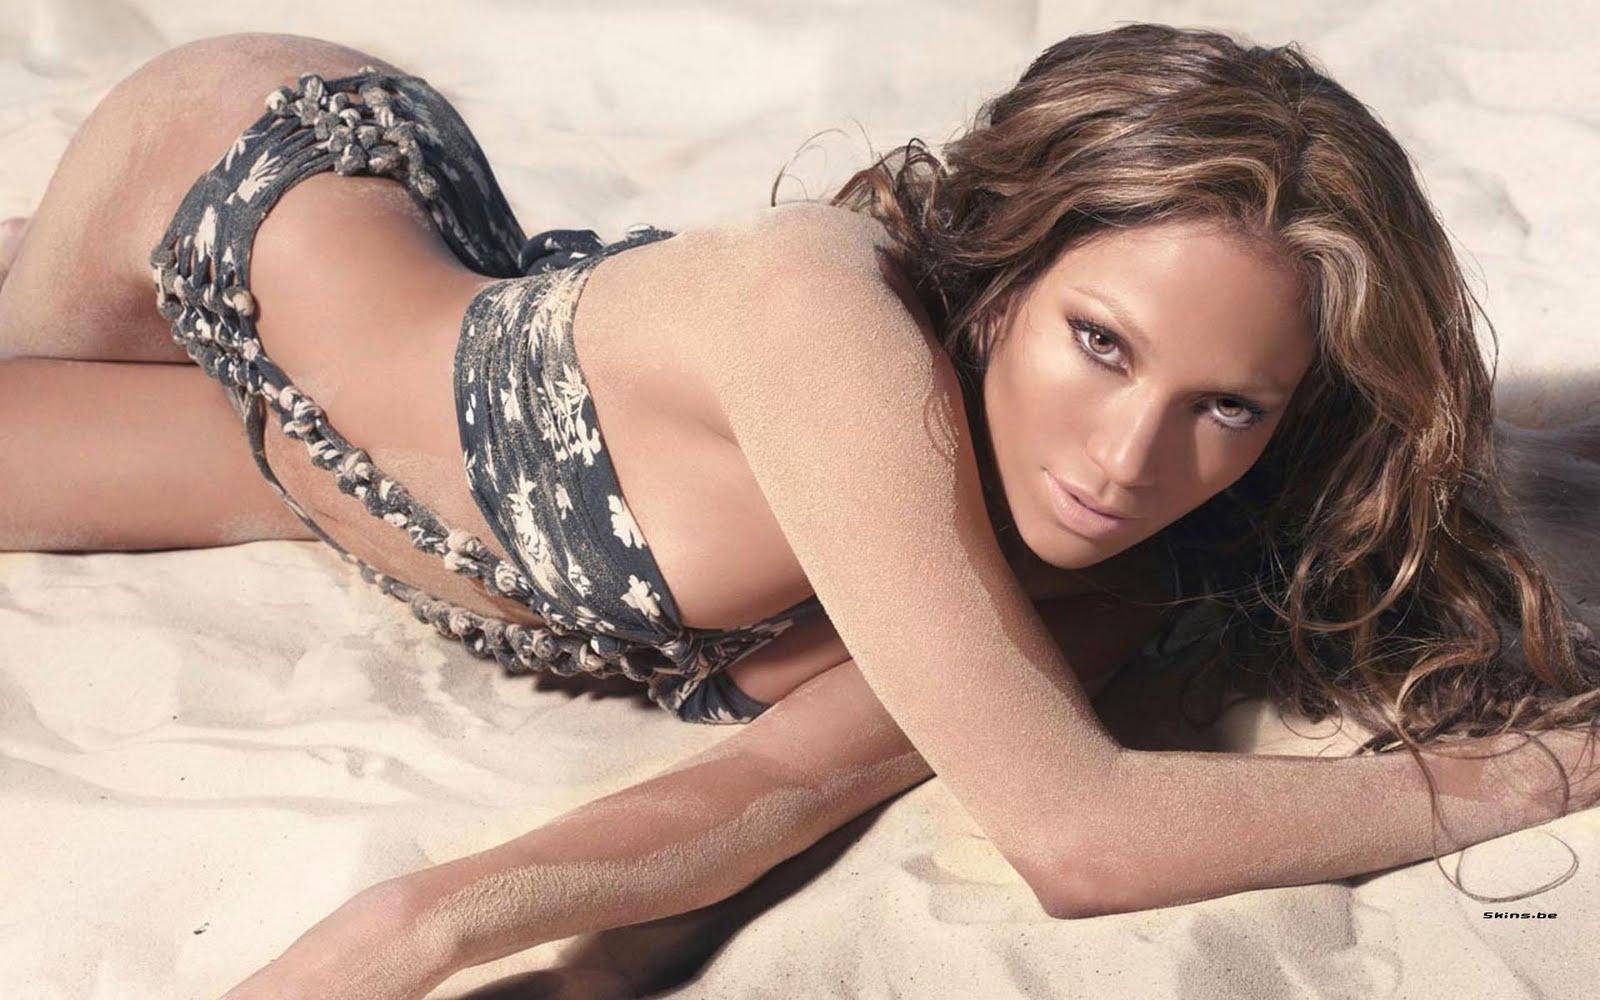 http://3.bp.blogspot.com/-ZMTdHjMGrpI/Tgxh2X8soXI/AAAAAAAAAOk/r7IPgKIOME0/s1600/Jennifer-Lopez-Hot-Wallpaper+06.JPG